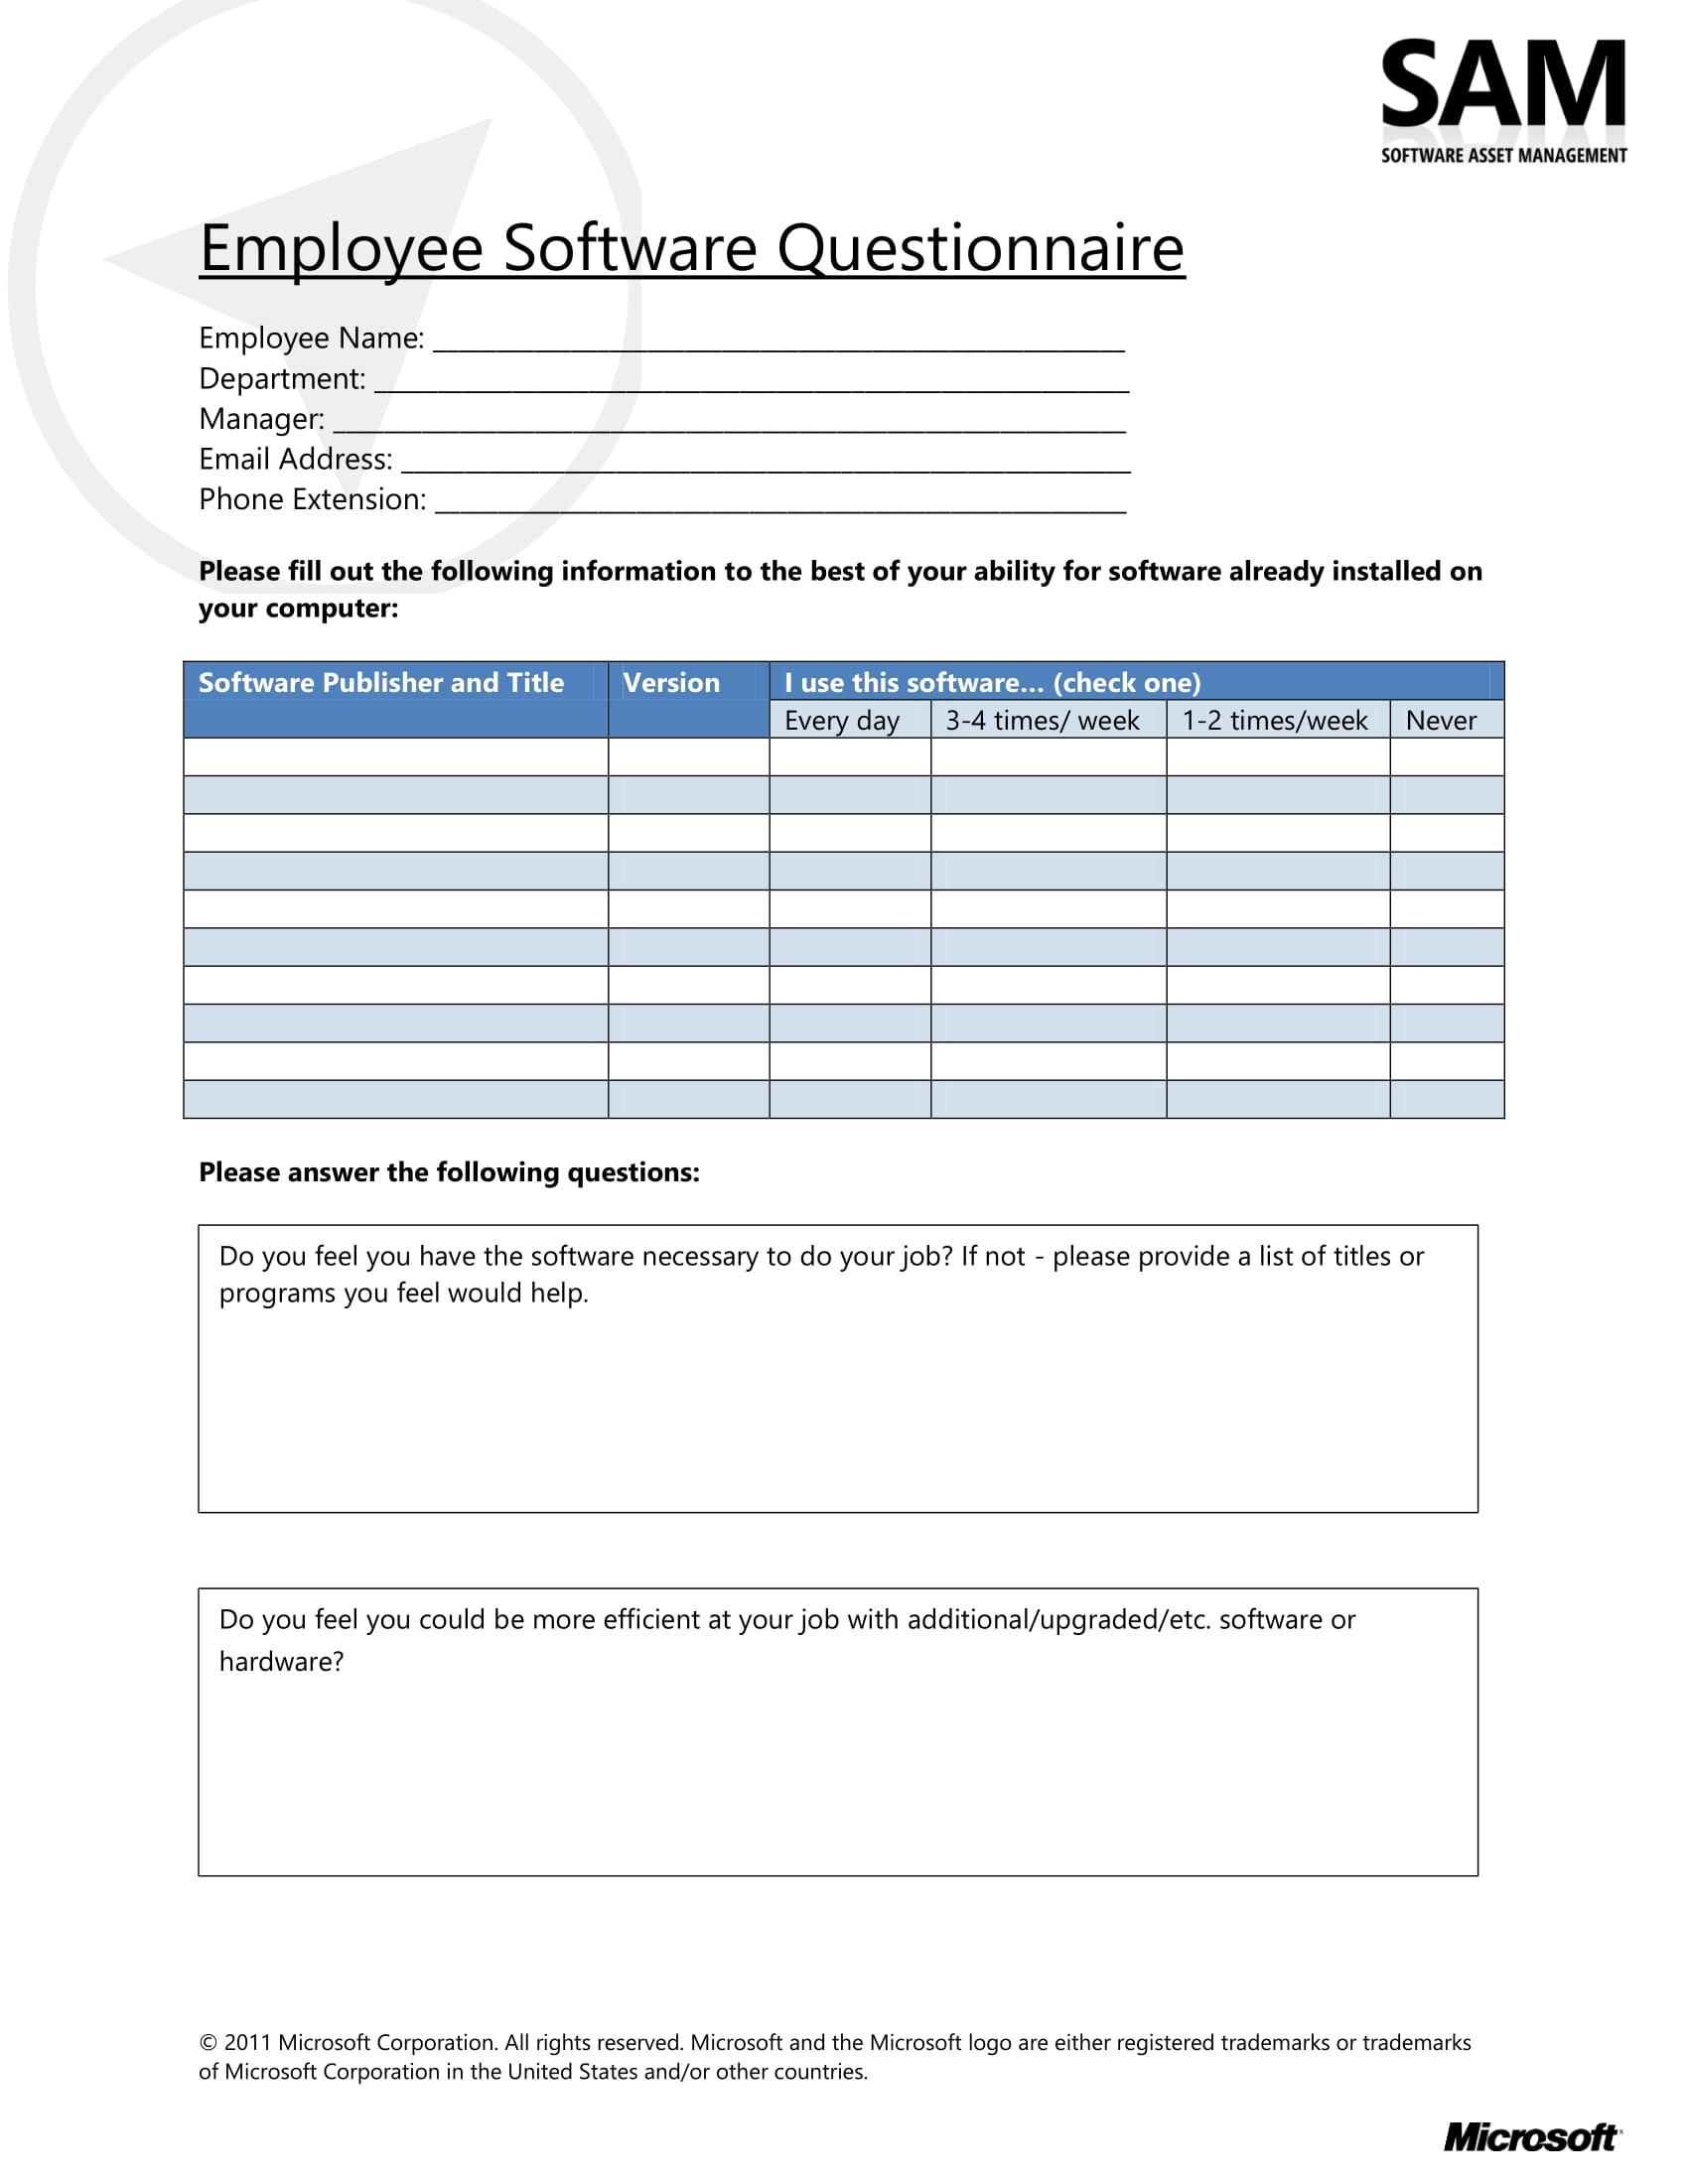 employee software questionnaire survey form 1